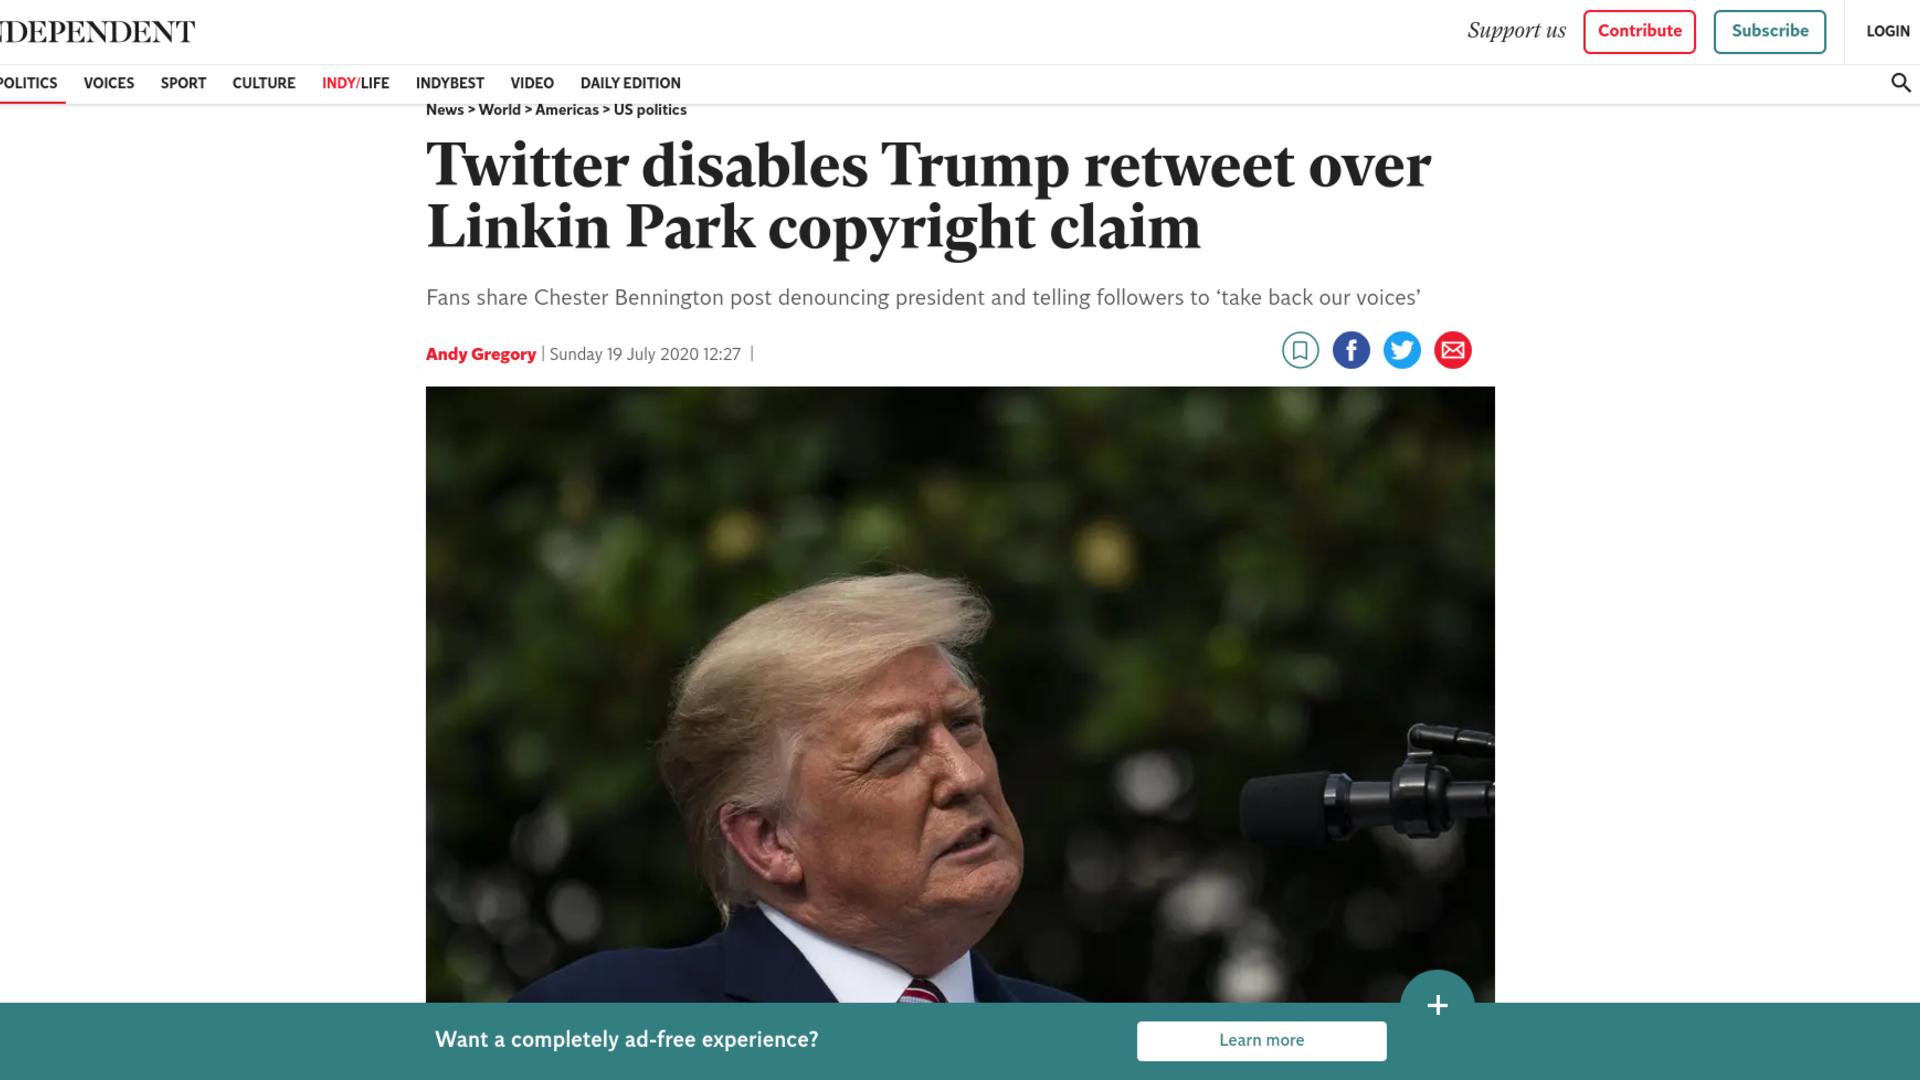 Fairness Rocks News Twitter disables Trump retweet over Linkin Park copyright claim